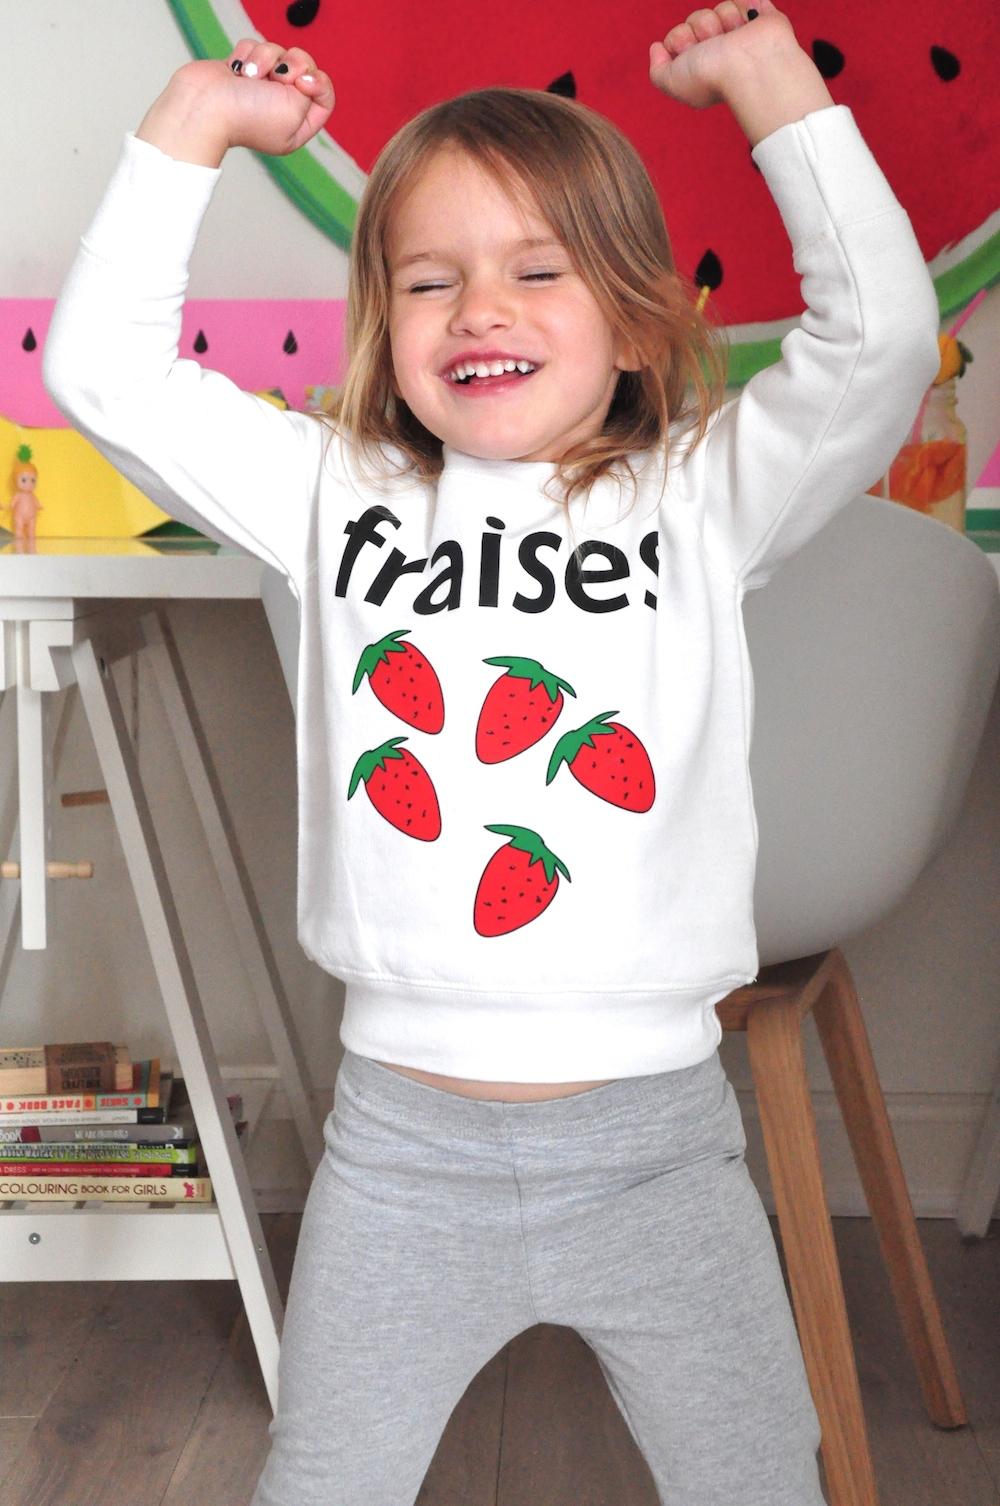 hugo_loves_tiki_fraises_sweatshirt